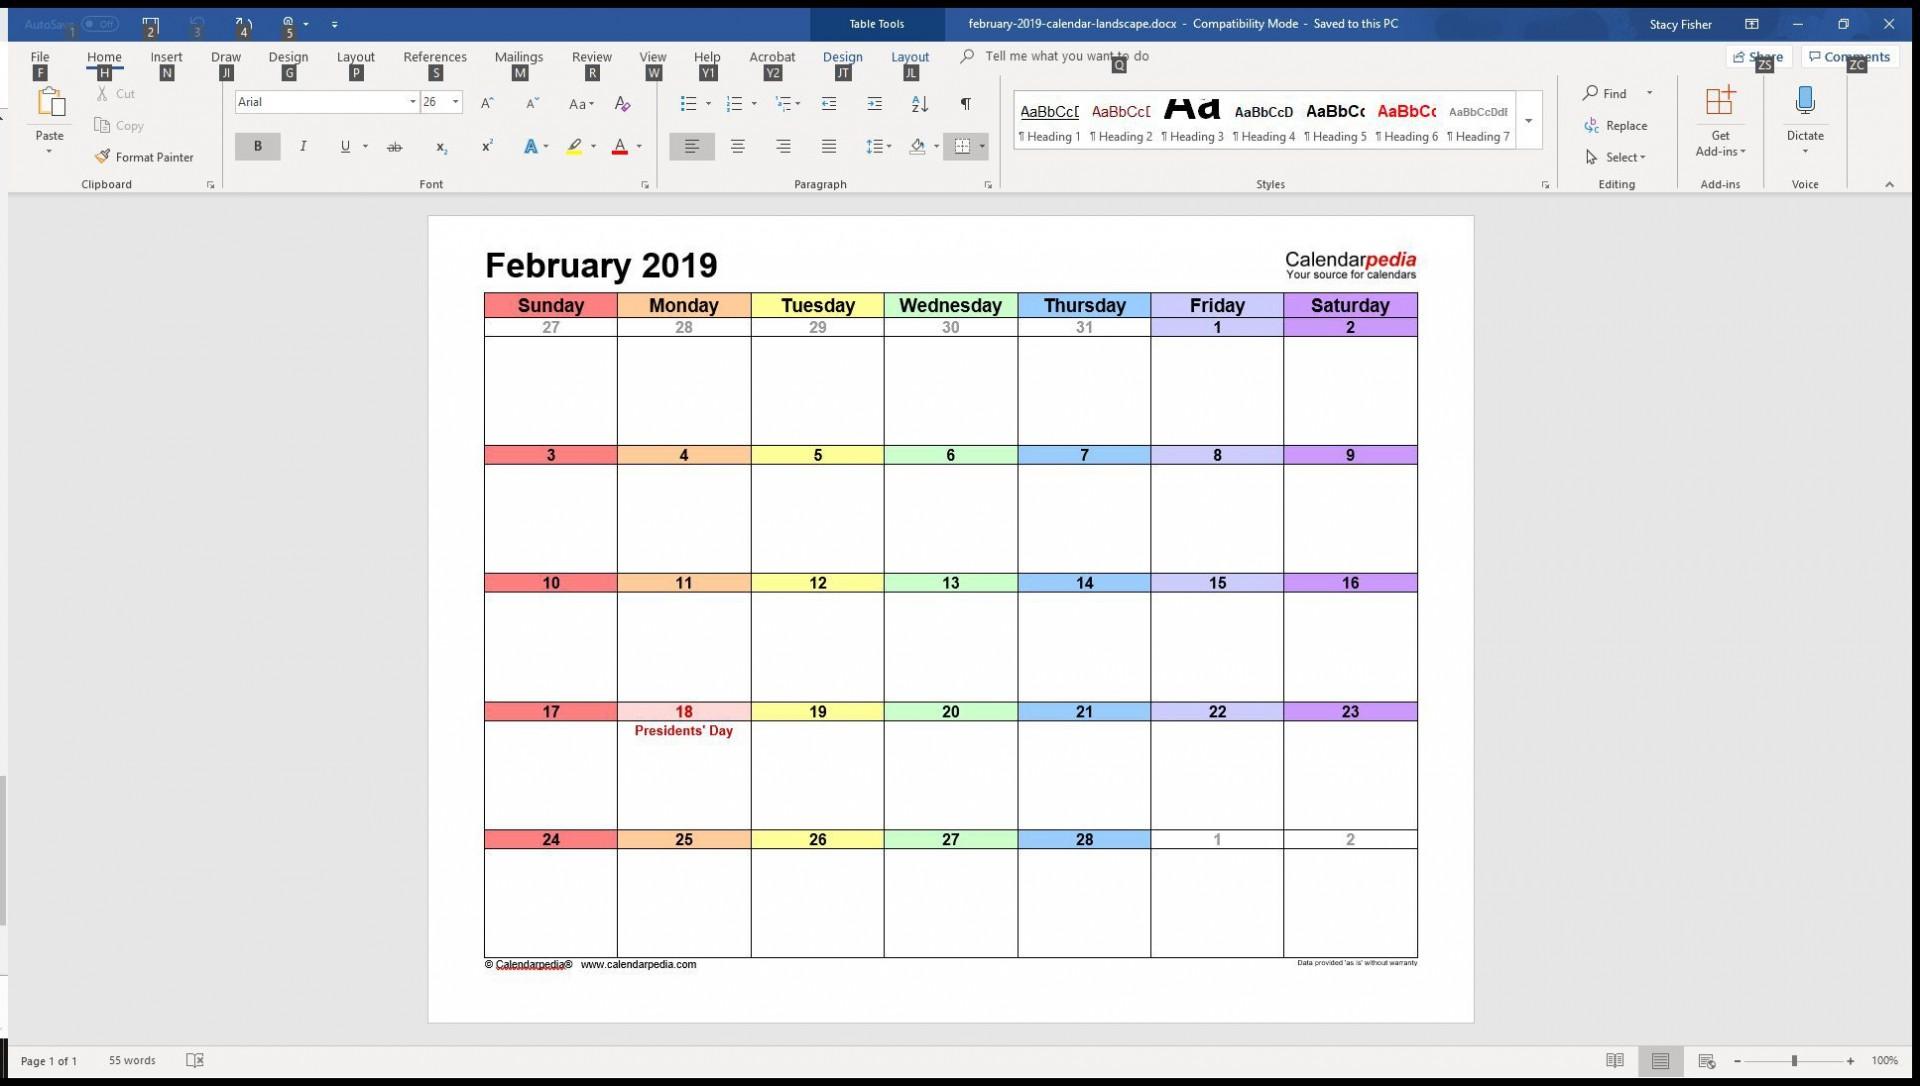 005 Surprising Calendar Template For Word 2007 Sample 1920